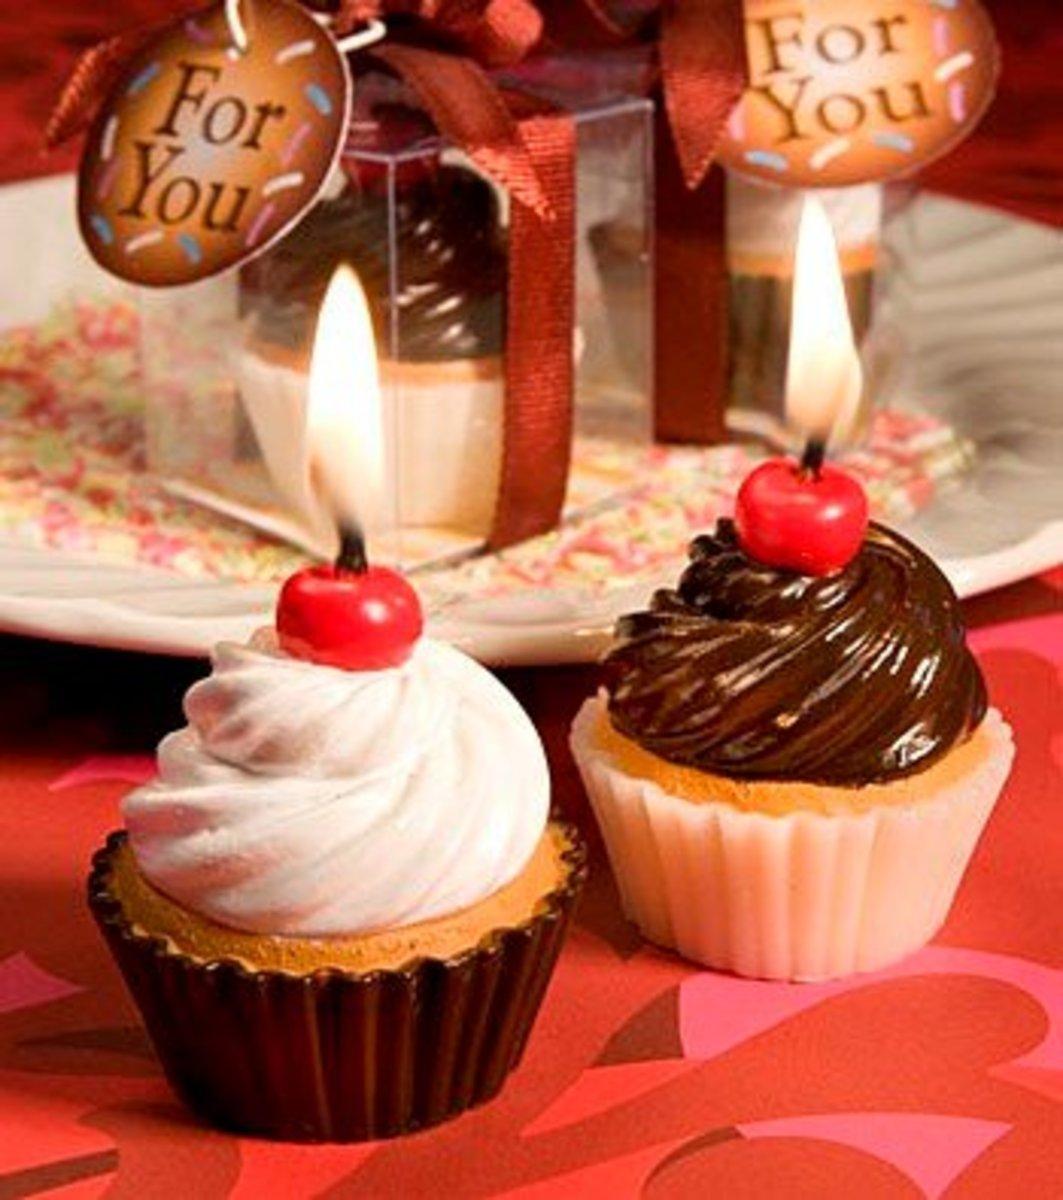 handiwork-decorationhow-to-make-cupcake-candles